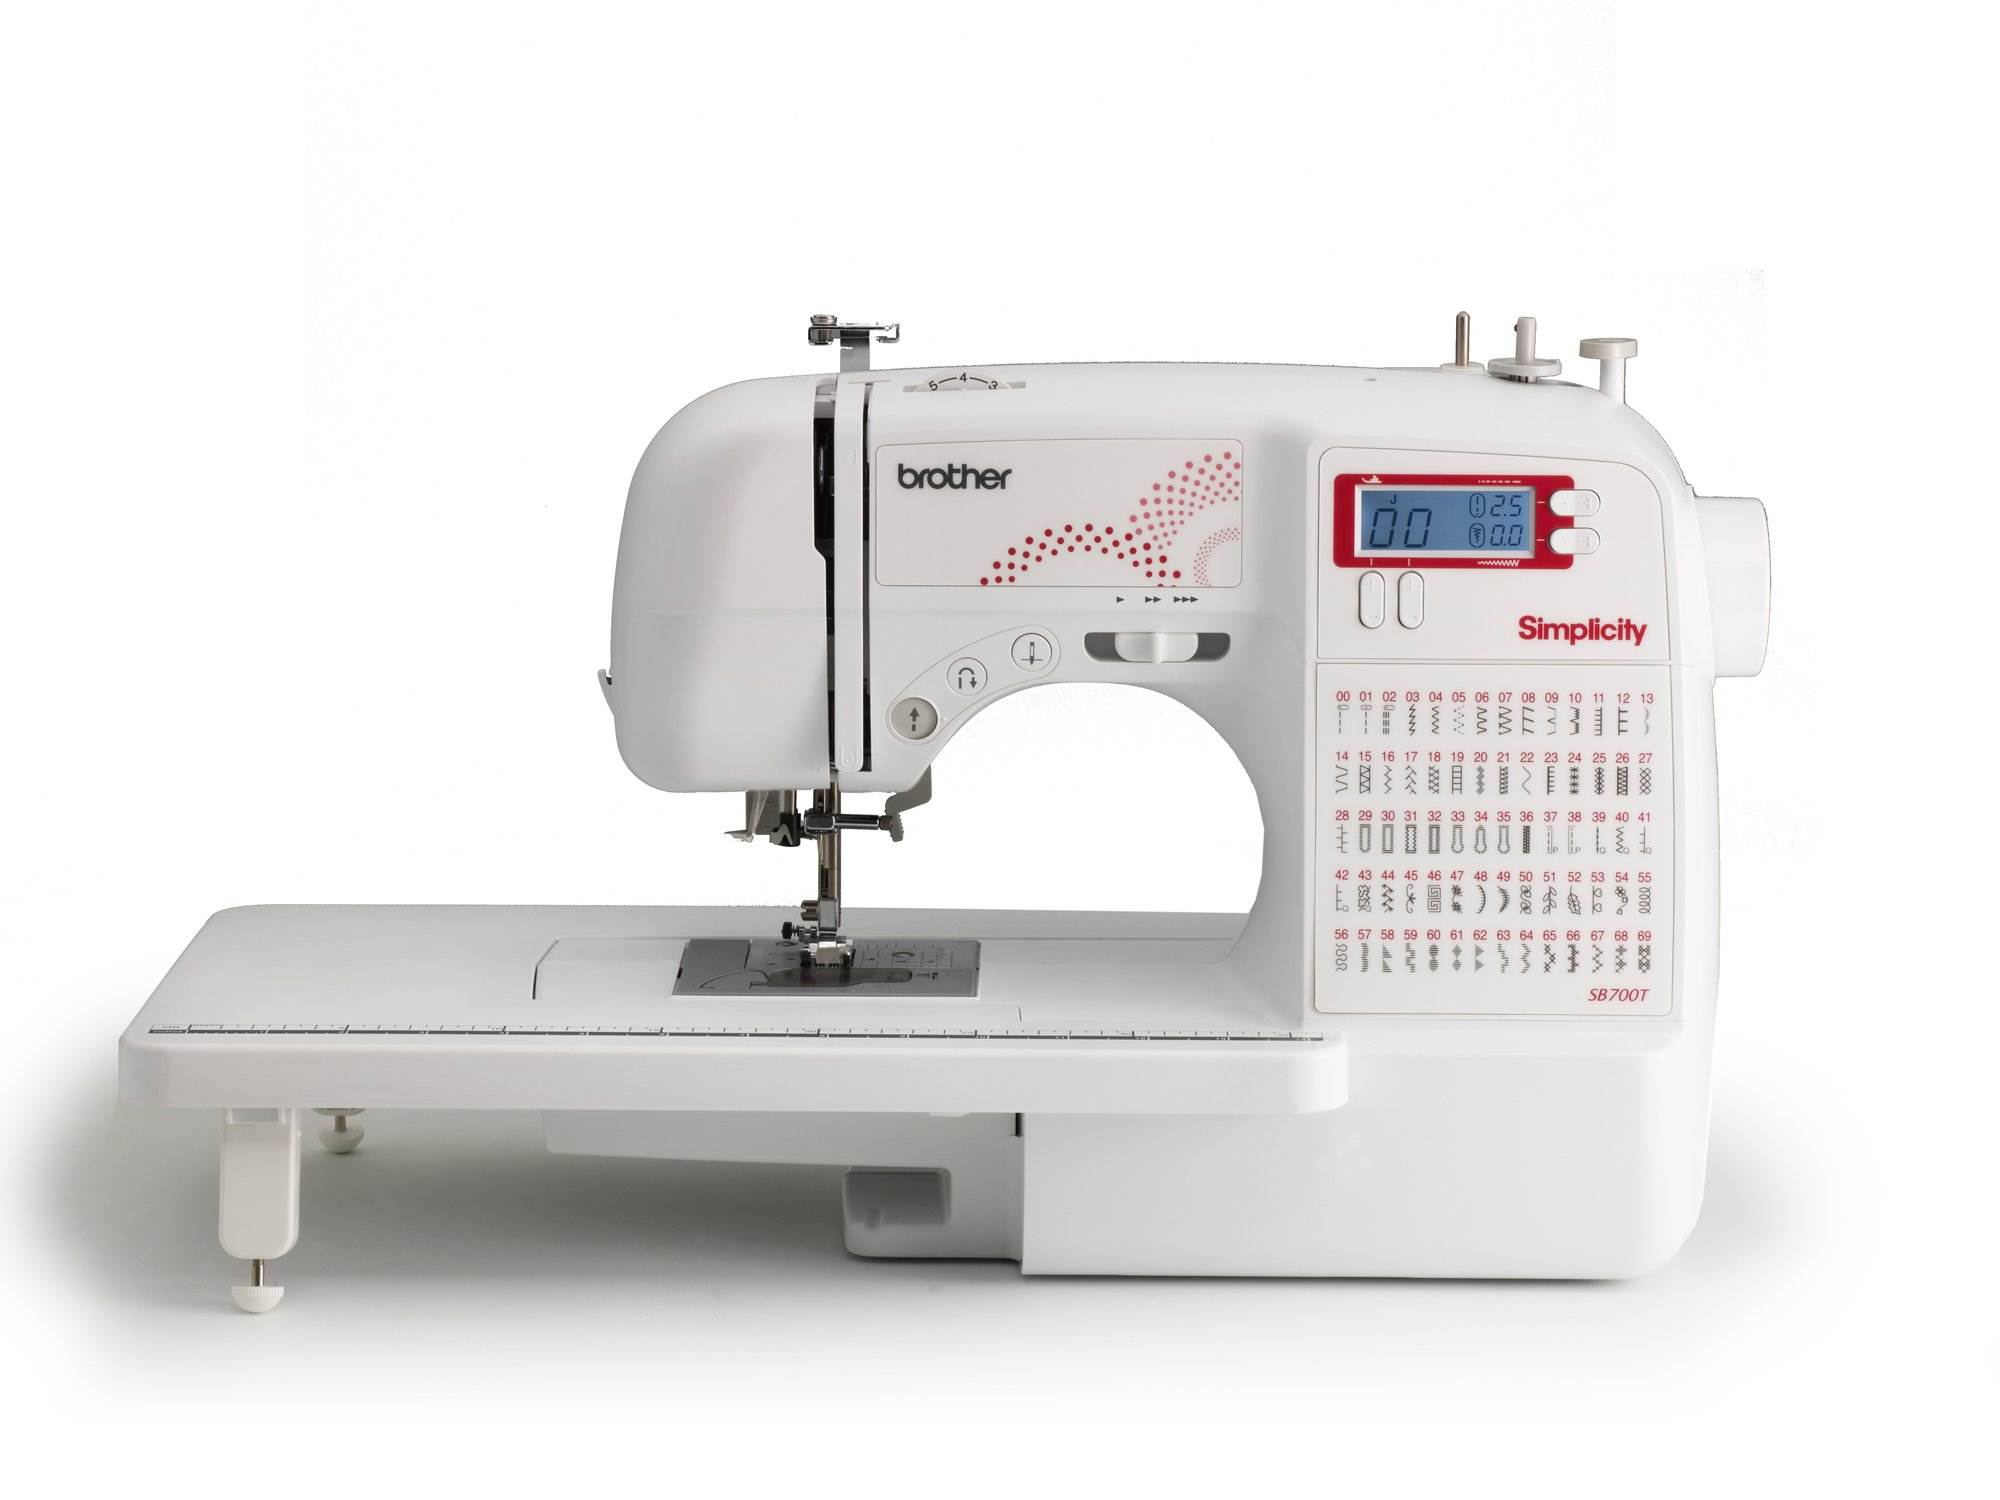 vq2400 sewing machine